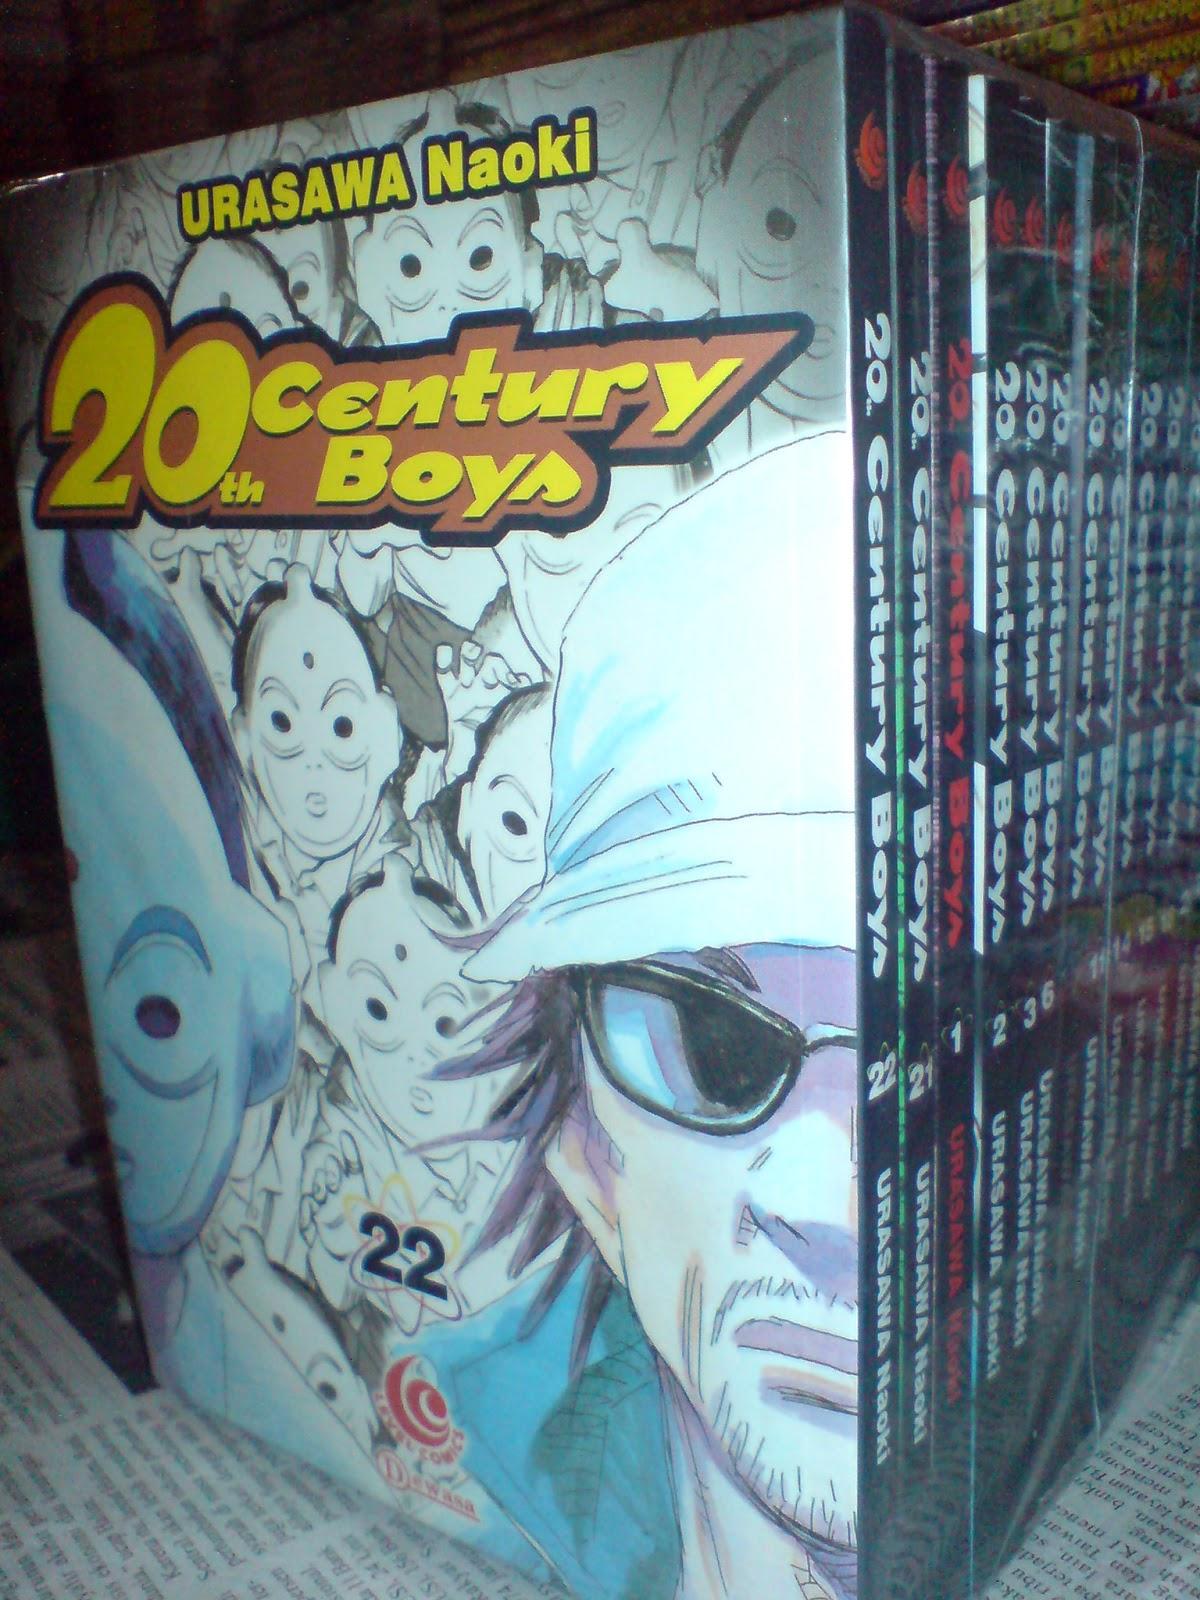 Komik/Manga Novel Buku Online - Jual Beli Komik Novel Lengkap Online